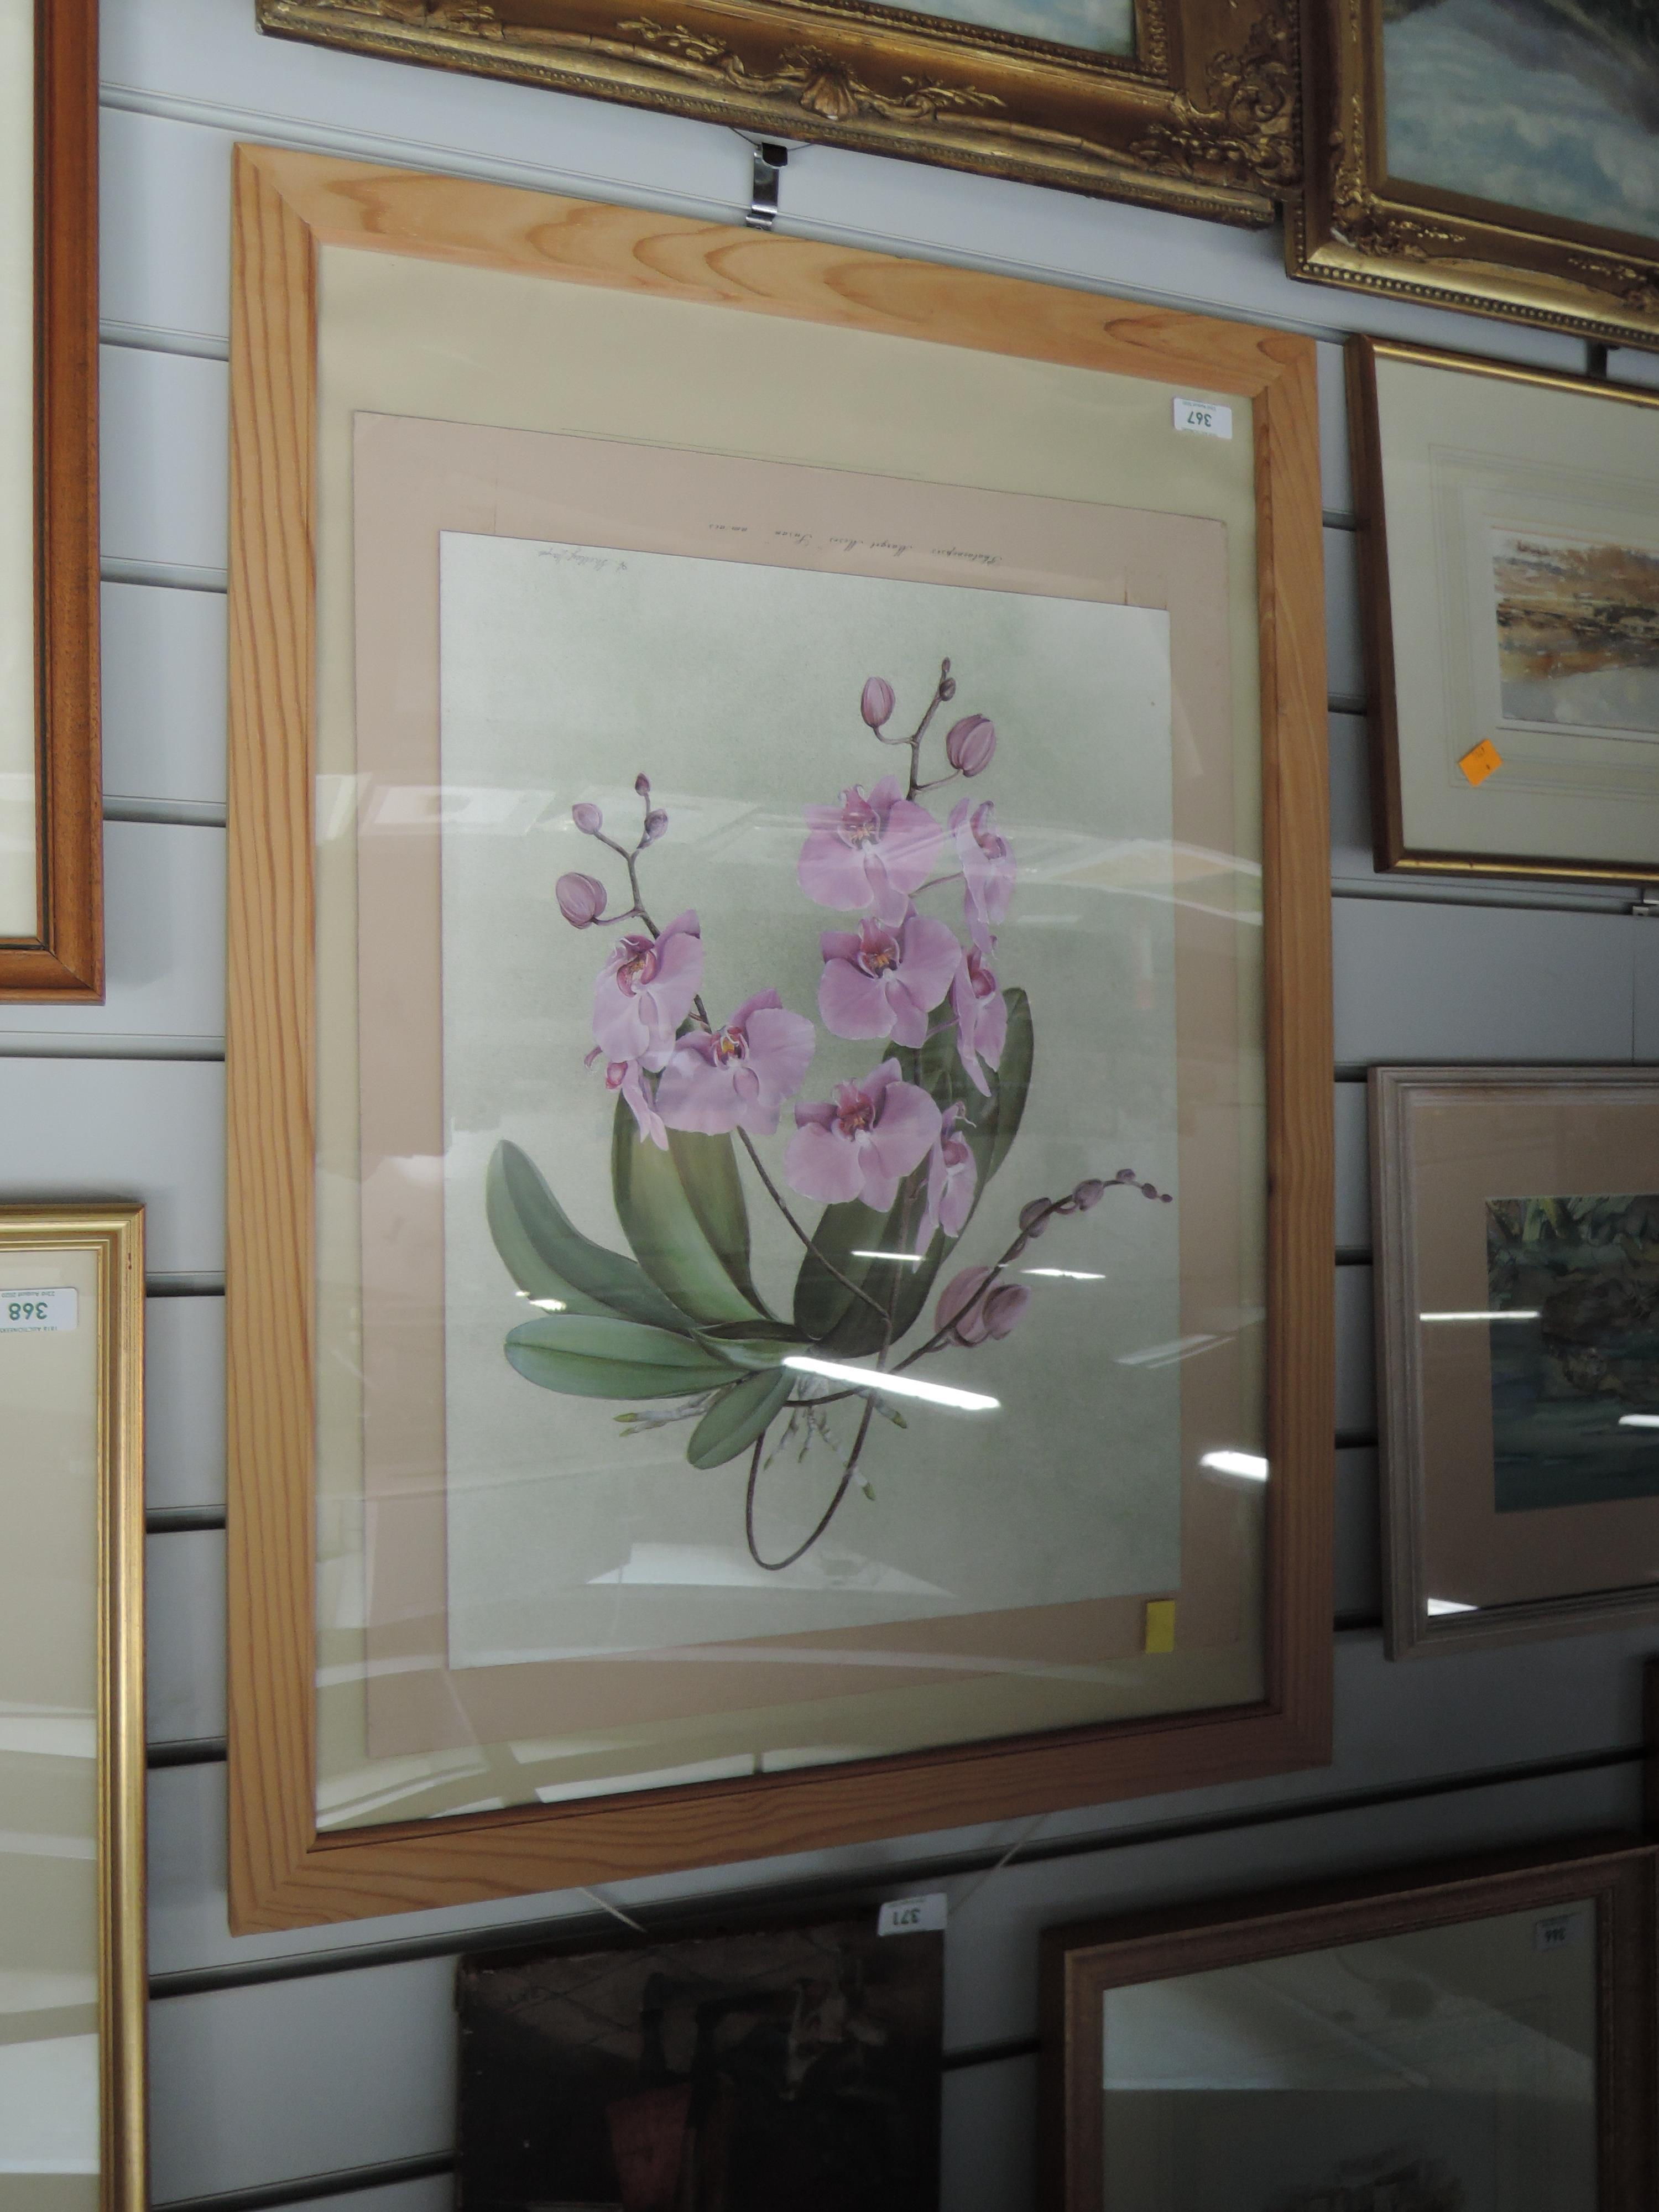 Lot 367 - A watercolour, A Shelley Lloyd, Phalaenopsis, still life, signed, framed and glazed, 50 x 37cm